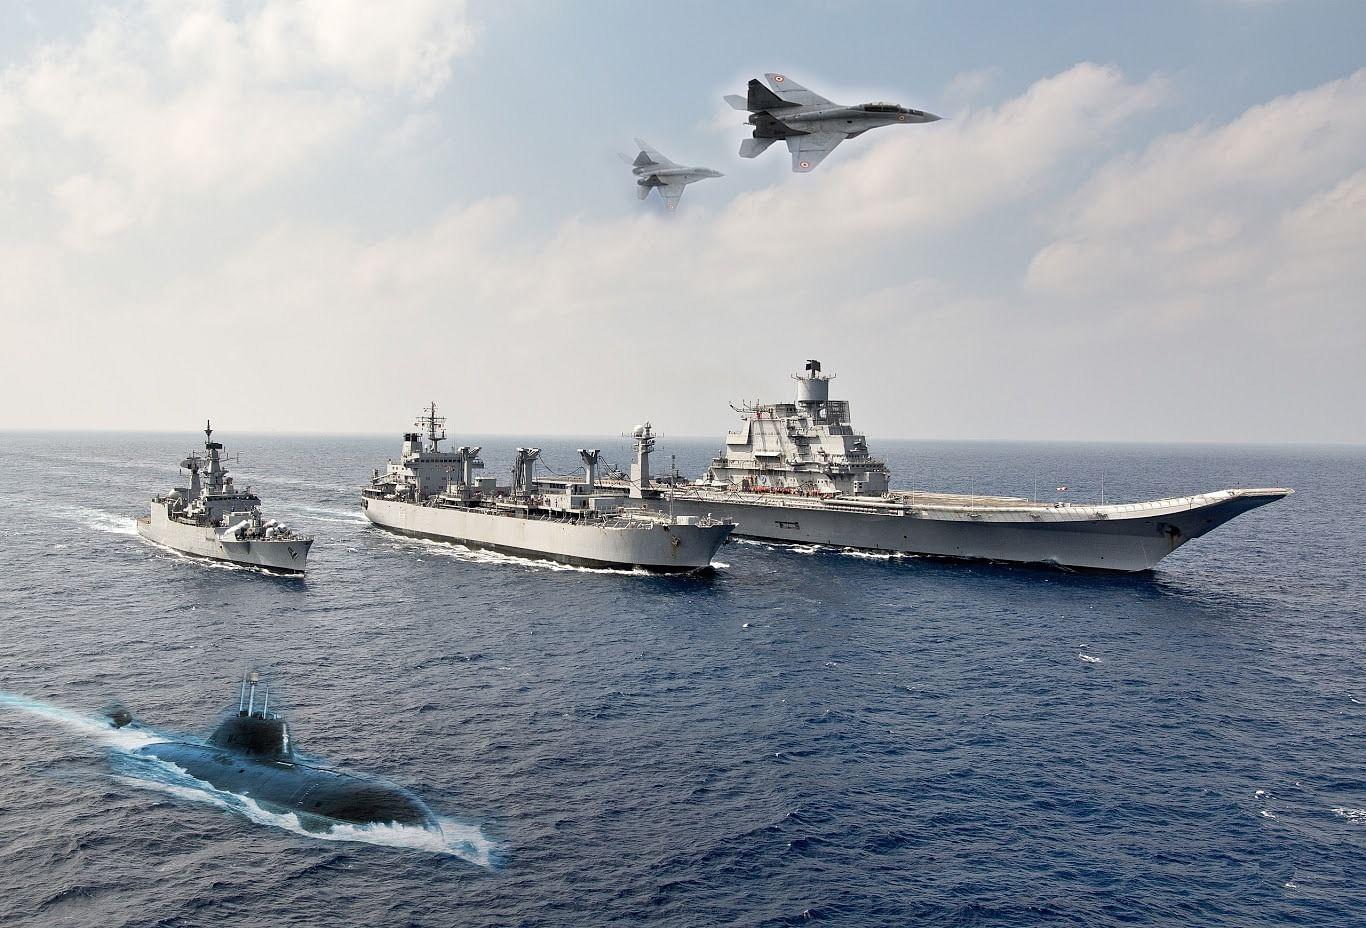 Navy - aricraft